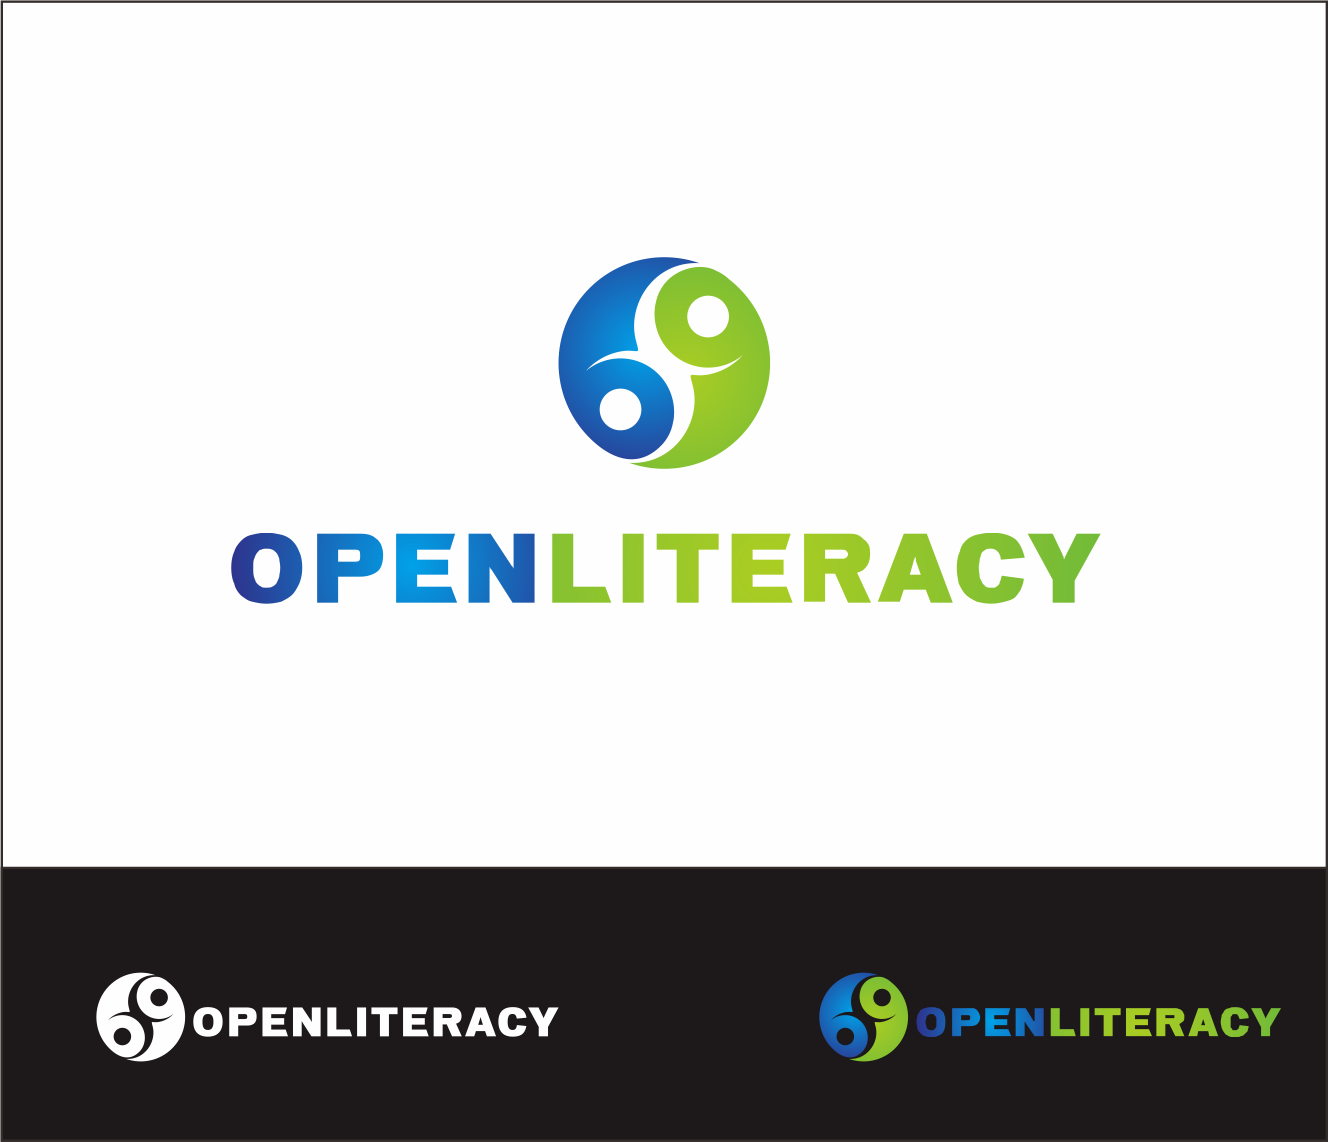 Logo Design by Armada Jamaluddin - Entry No. 92 in the Logo Design Contest Inspiring Logo Design for OpenLiteracy.